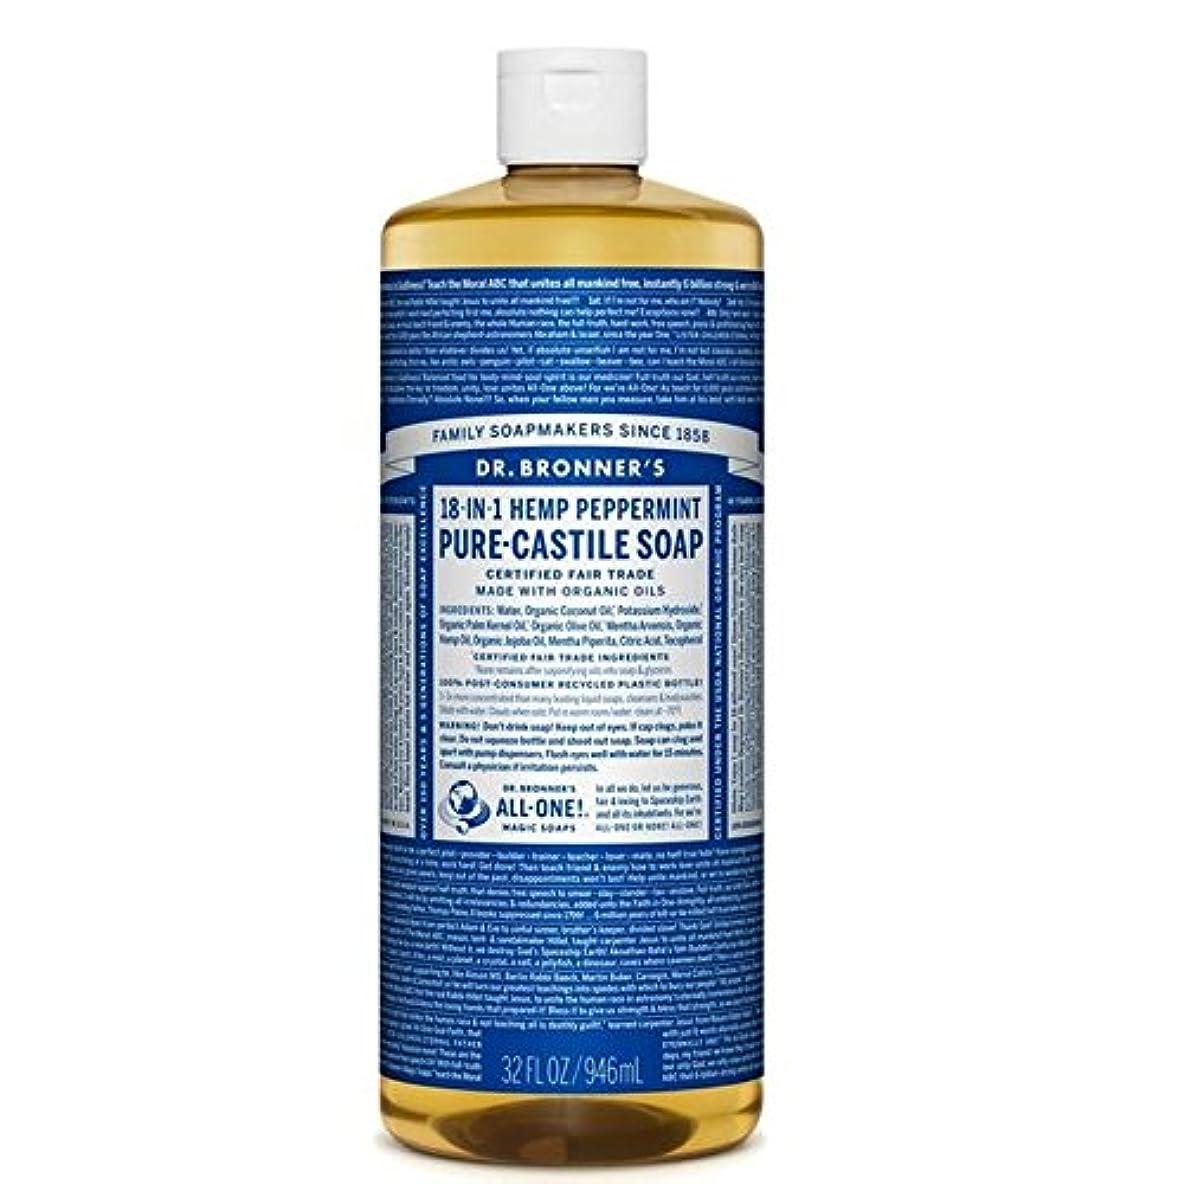 Dr Bronner Organic Peppermint Castile Liquid Soap 946ml (Pack of 6) - のブロナー有機ペパーミントカスティーリャ液体石鹸946ミリリットル x6 [並行輸入品]